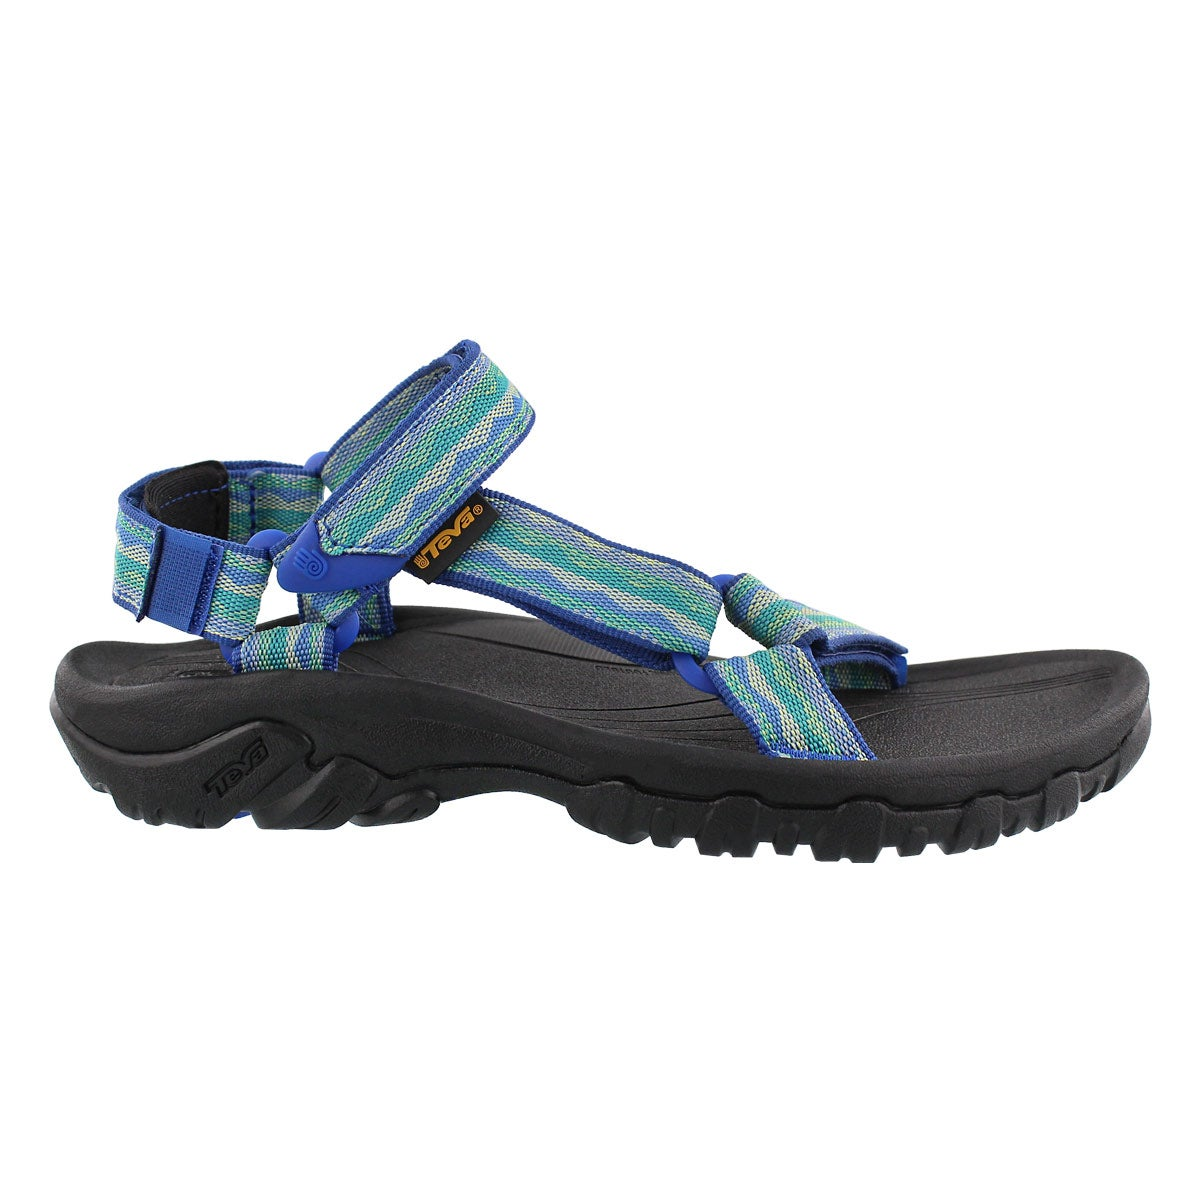 Lds HurricaneXLT lago blue sport sandal